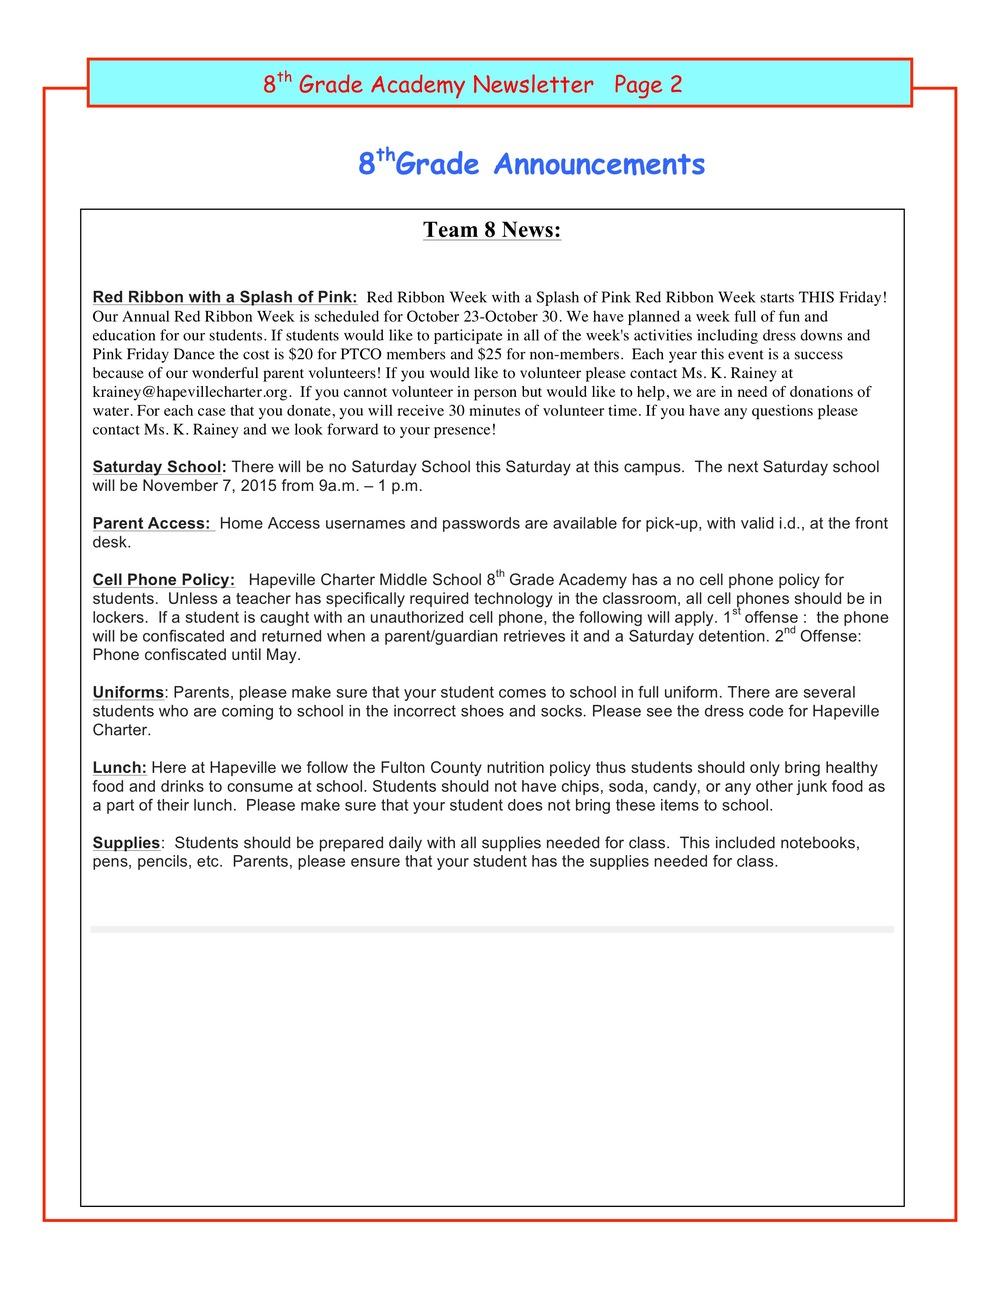 Newsletter Image8th grade October 27 2015 2.jpeg